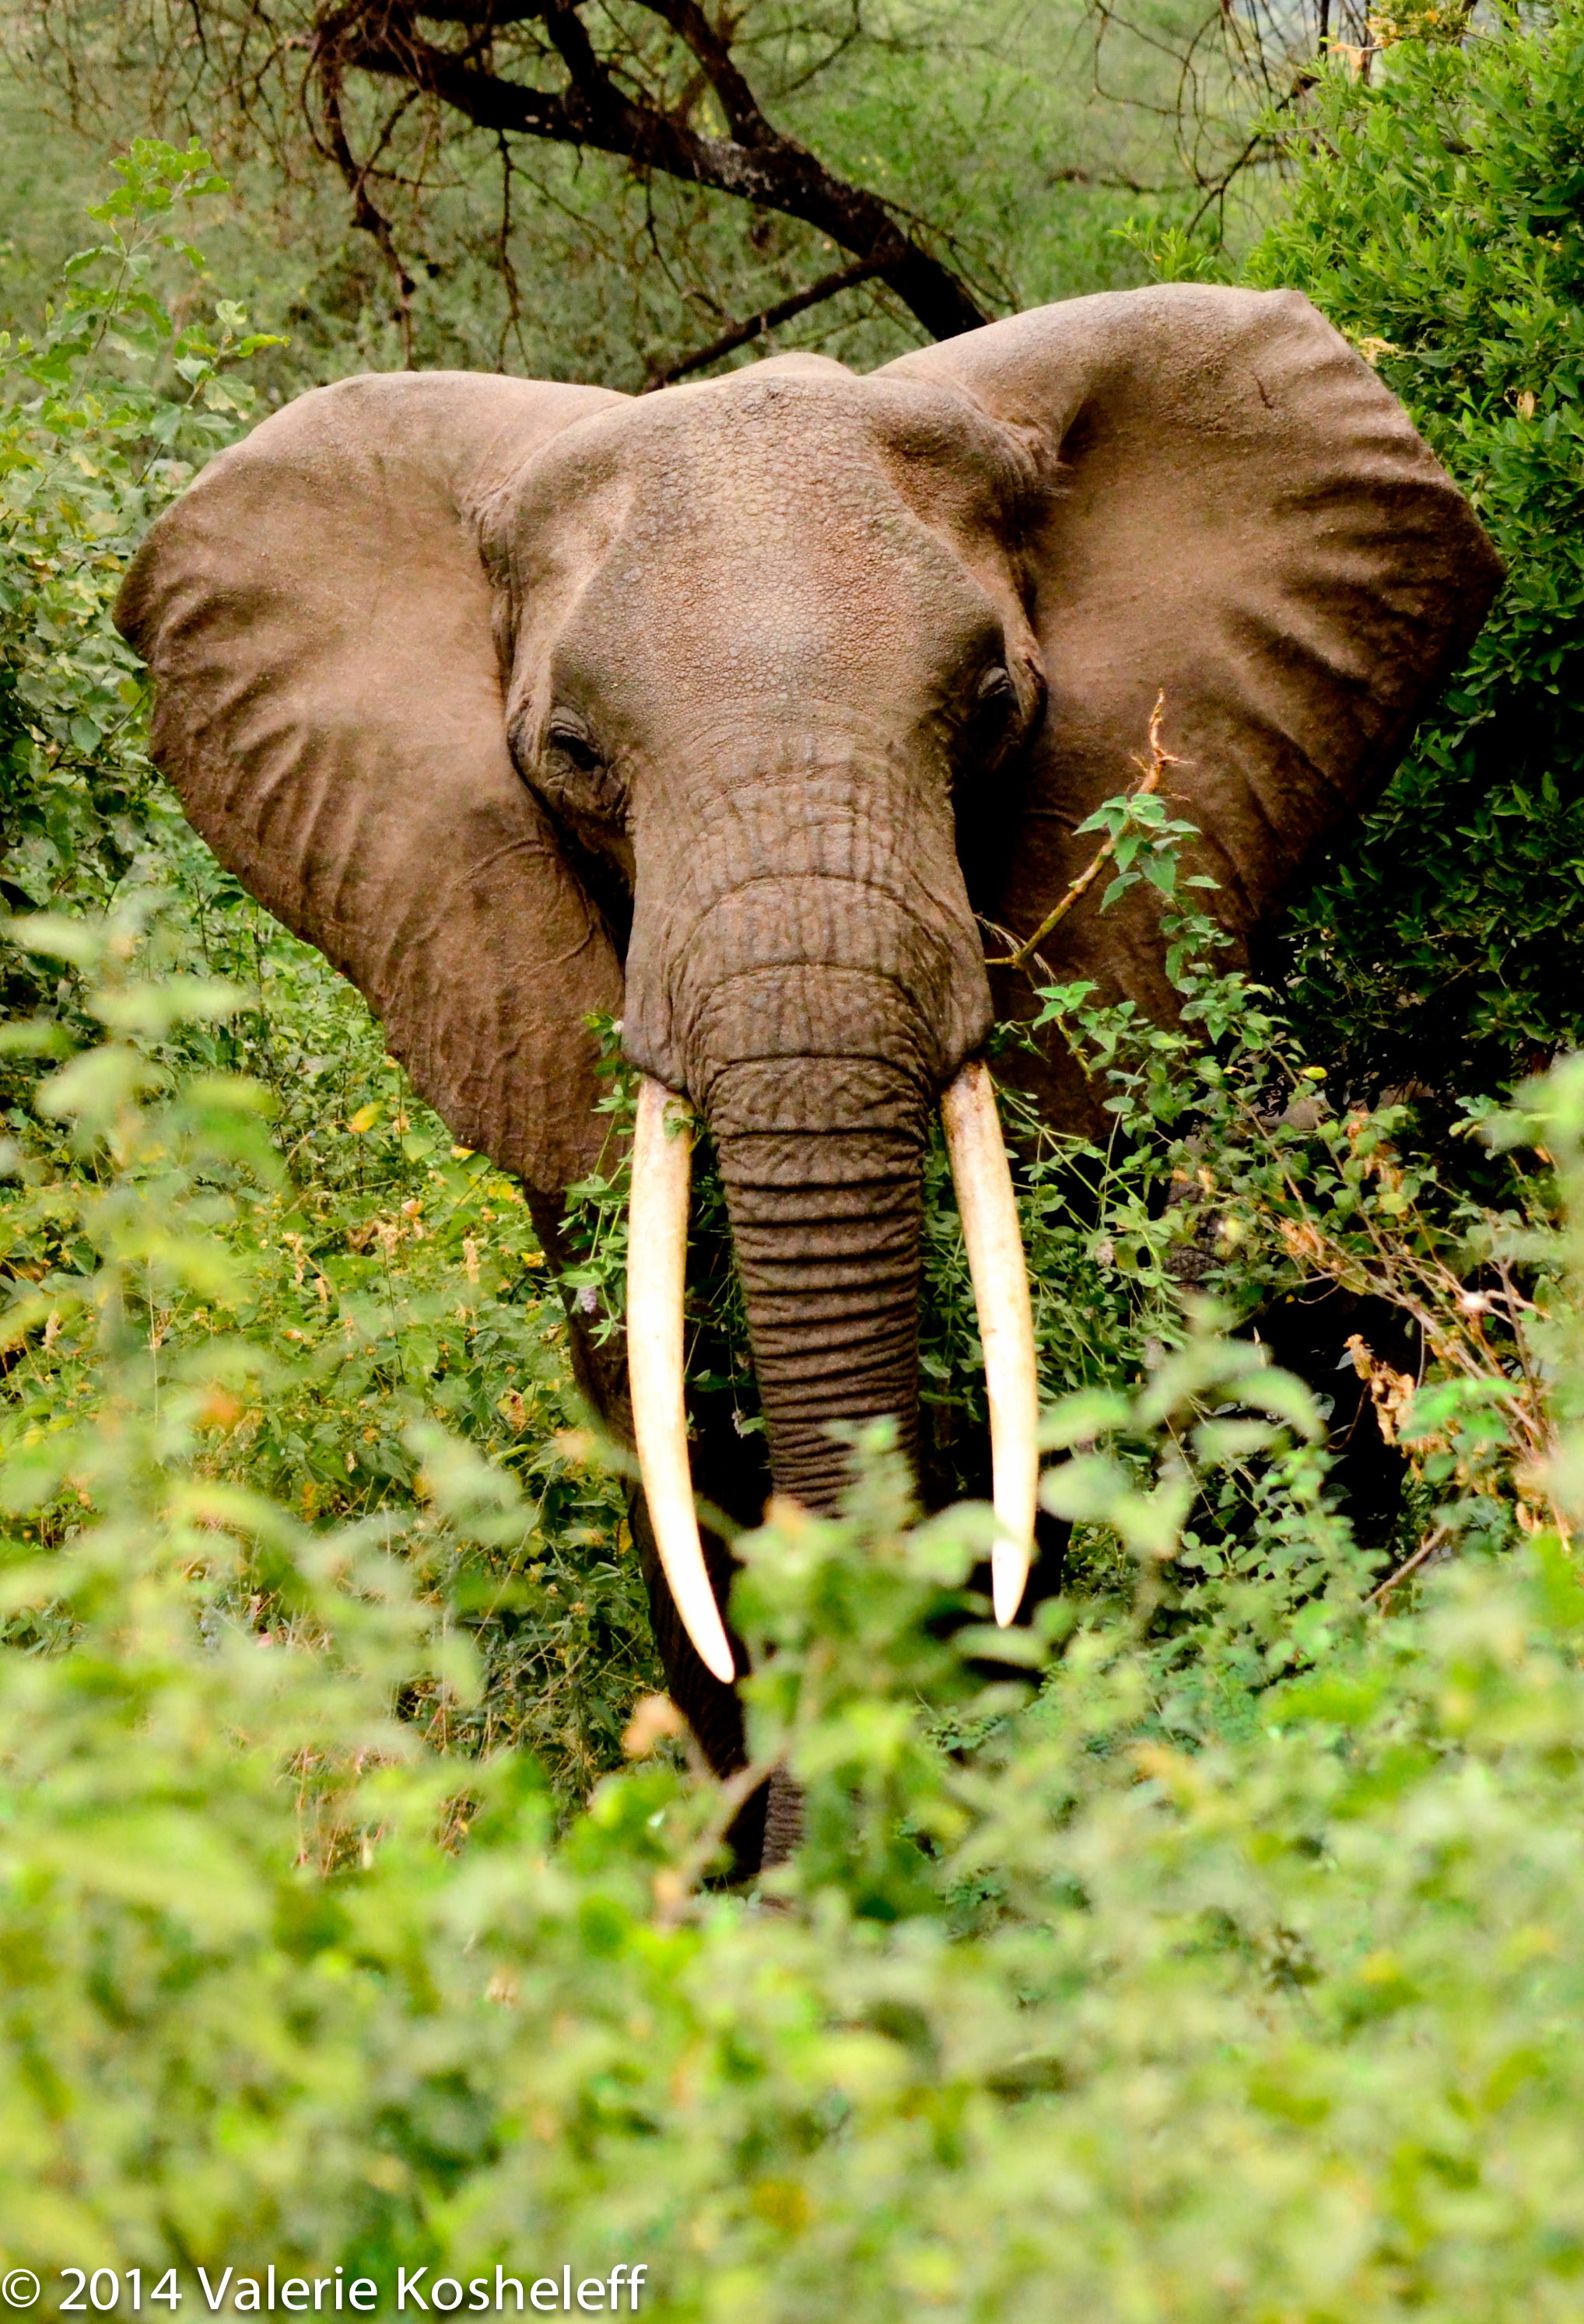 TZA_5194***Elephant Peering from Bushes_LTR_100%_4x6_WTRMK.jpg